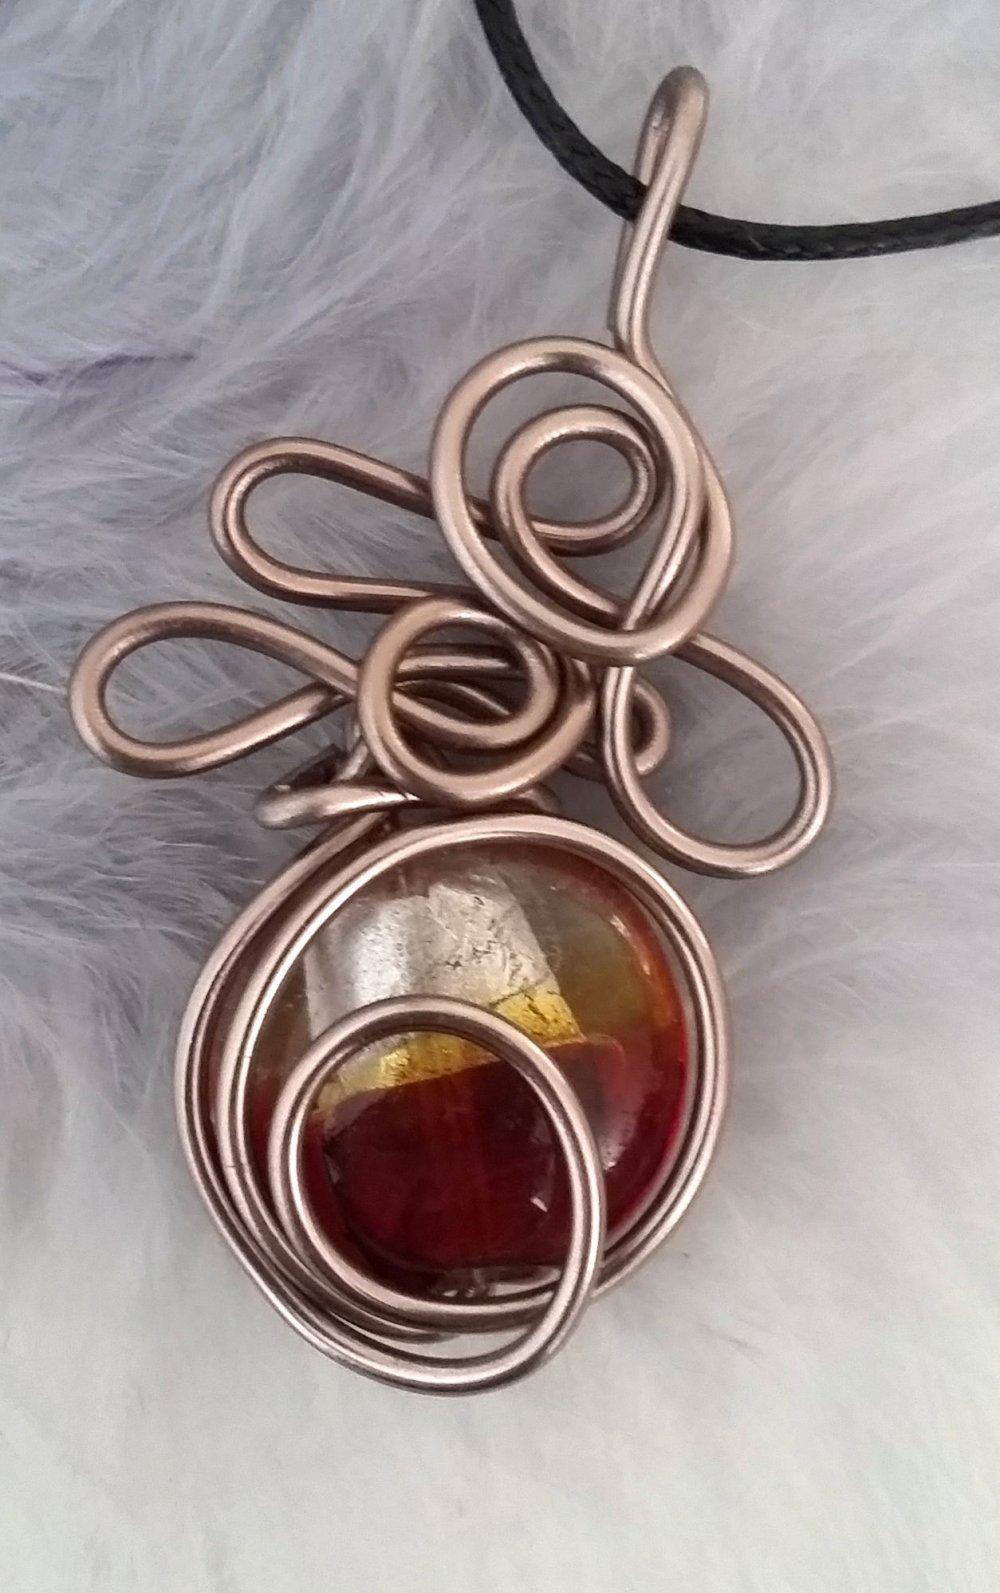 Pendentif perle de verre bombée et fil aluminium